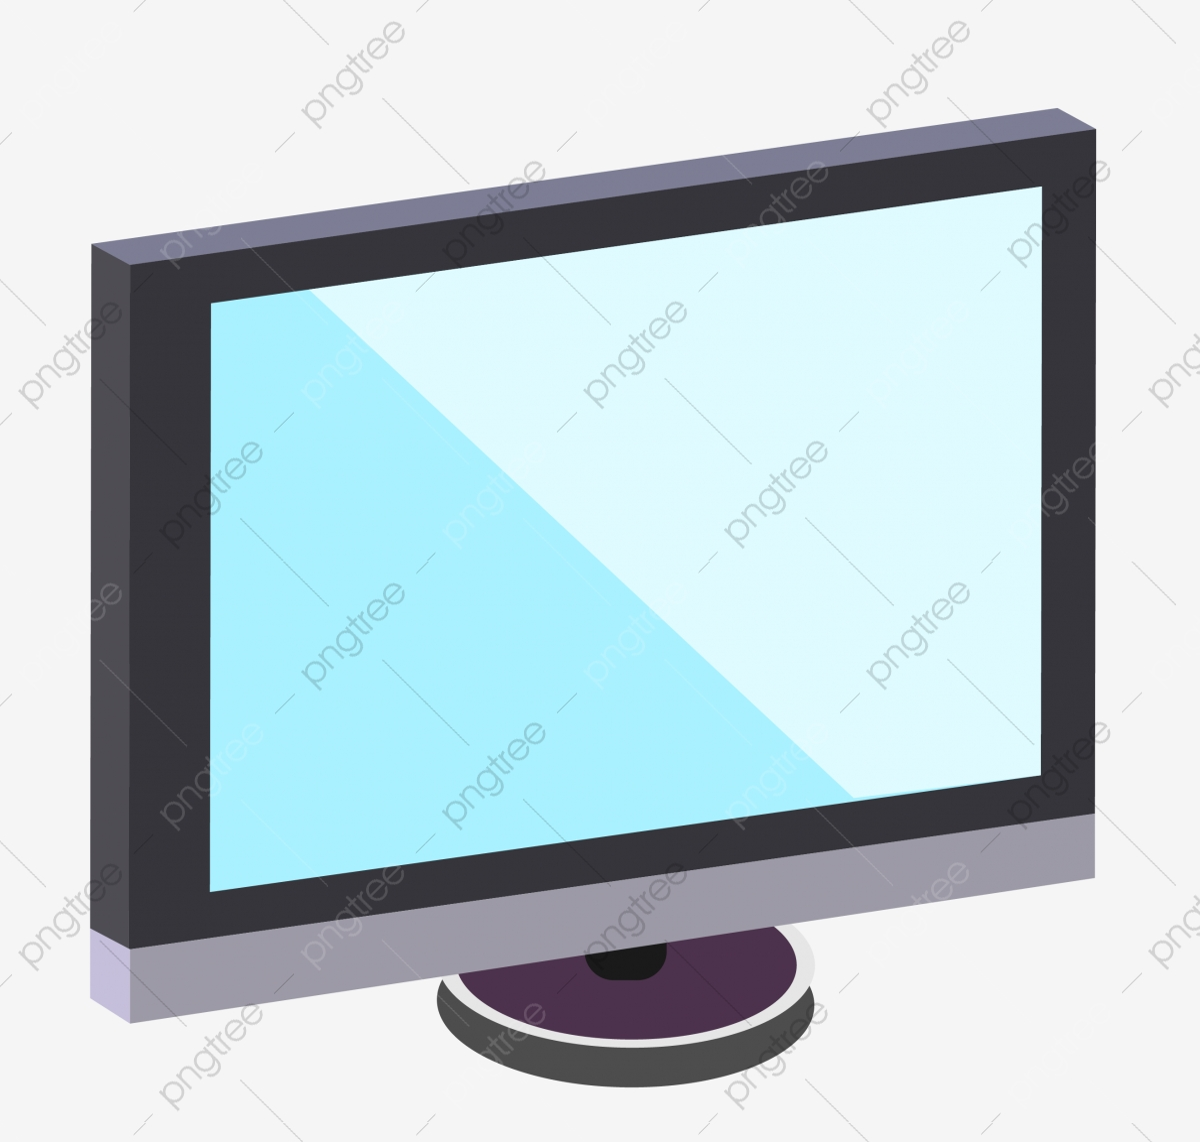 8 8d Black Monitor Illustration, Black Monitor, Black, Monitor PNG